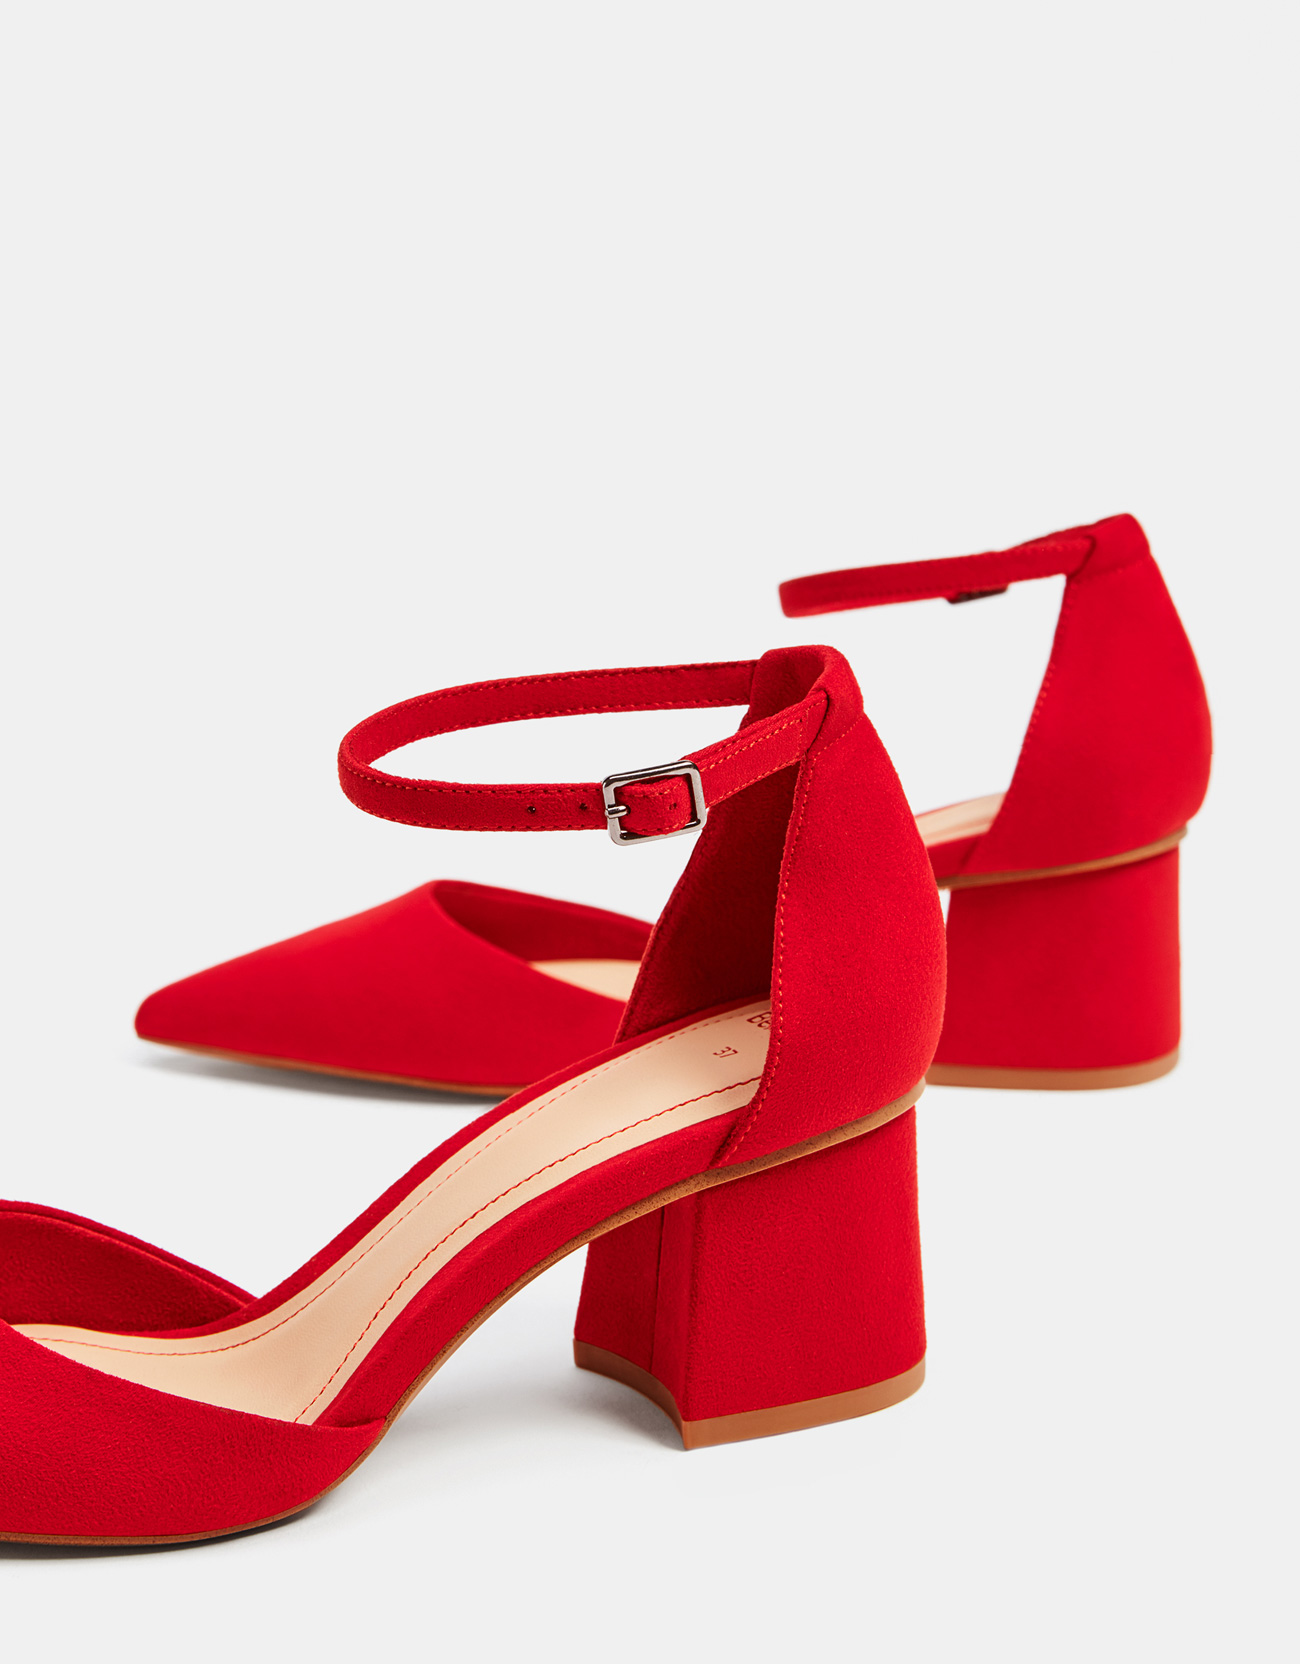 Red mid-heel shoes - SHOES - Bershka Indonesia